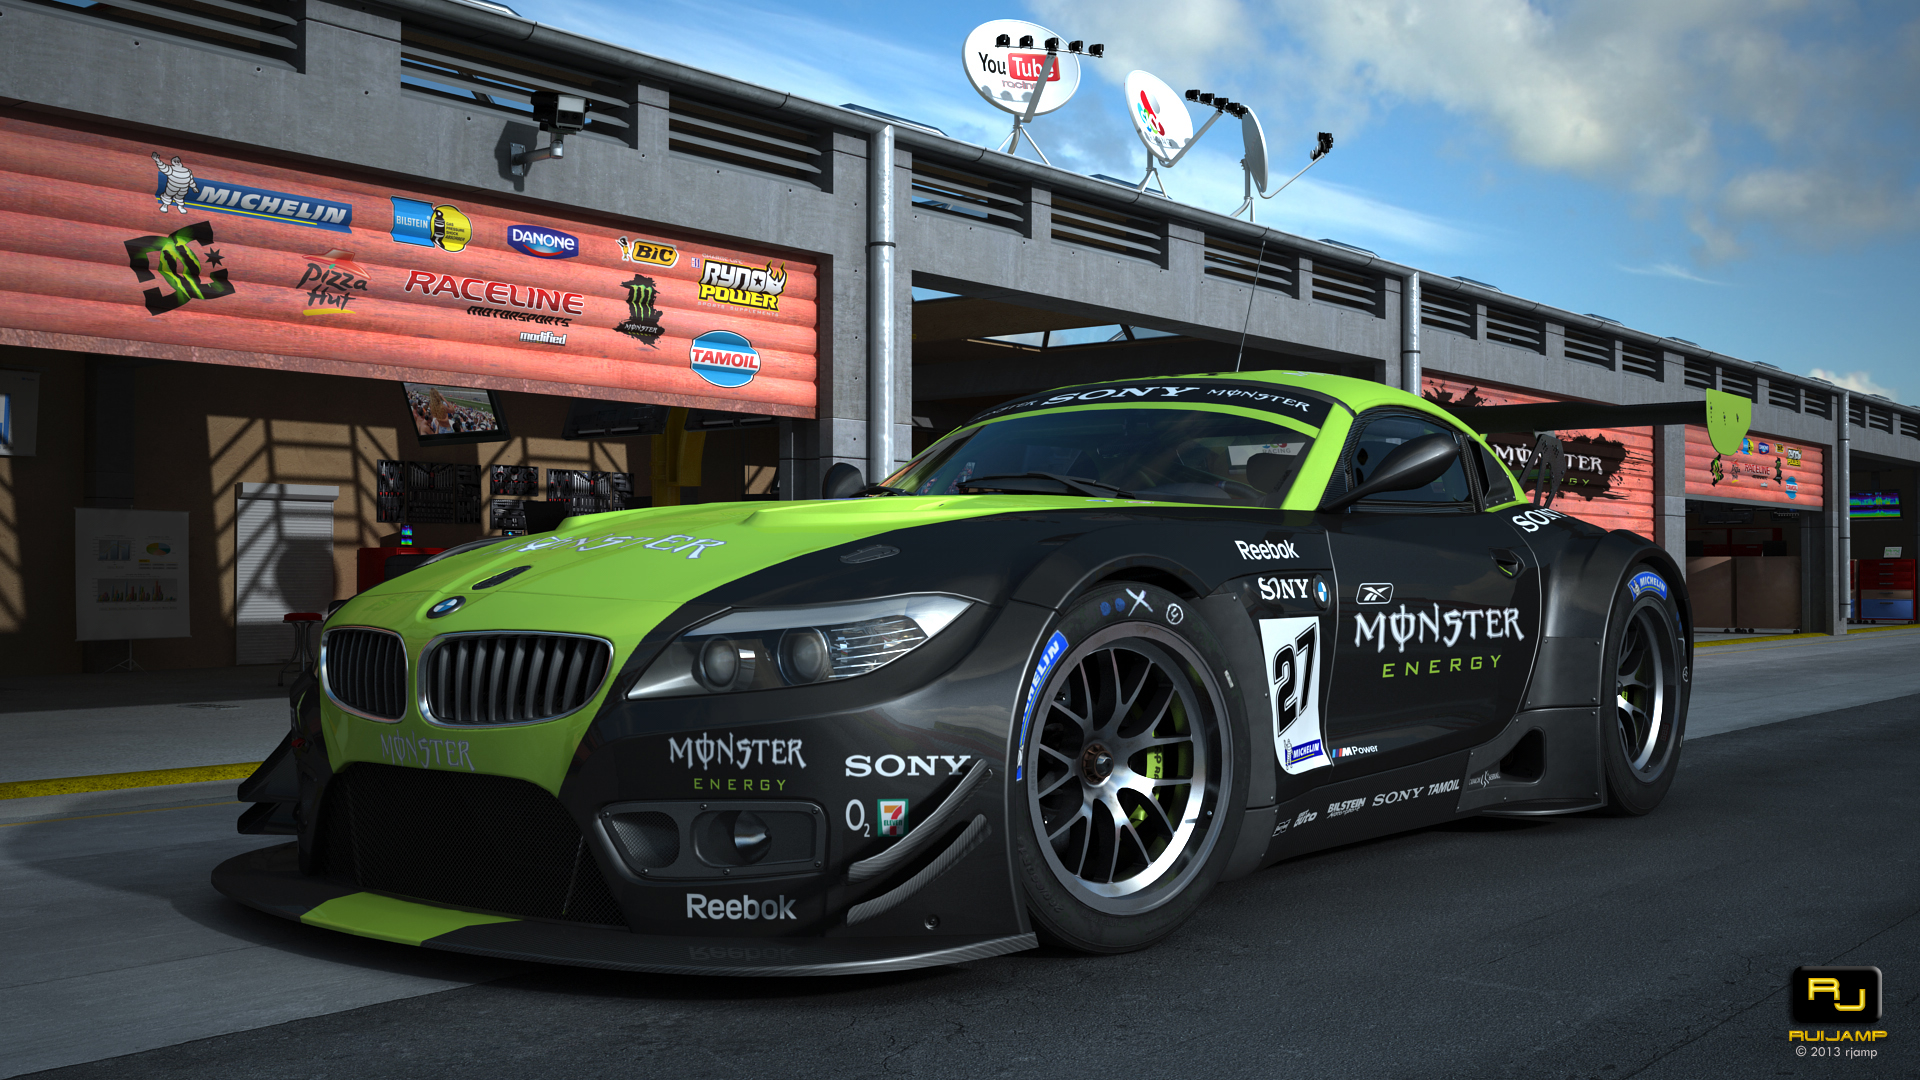 Bmw Z4 Gt3 Monster Race Track Scene By Rjamp On Deviantart